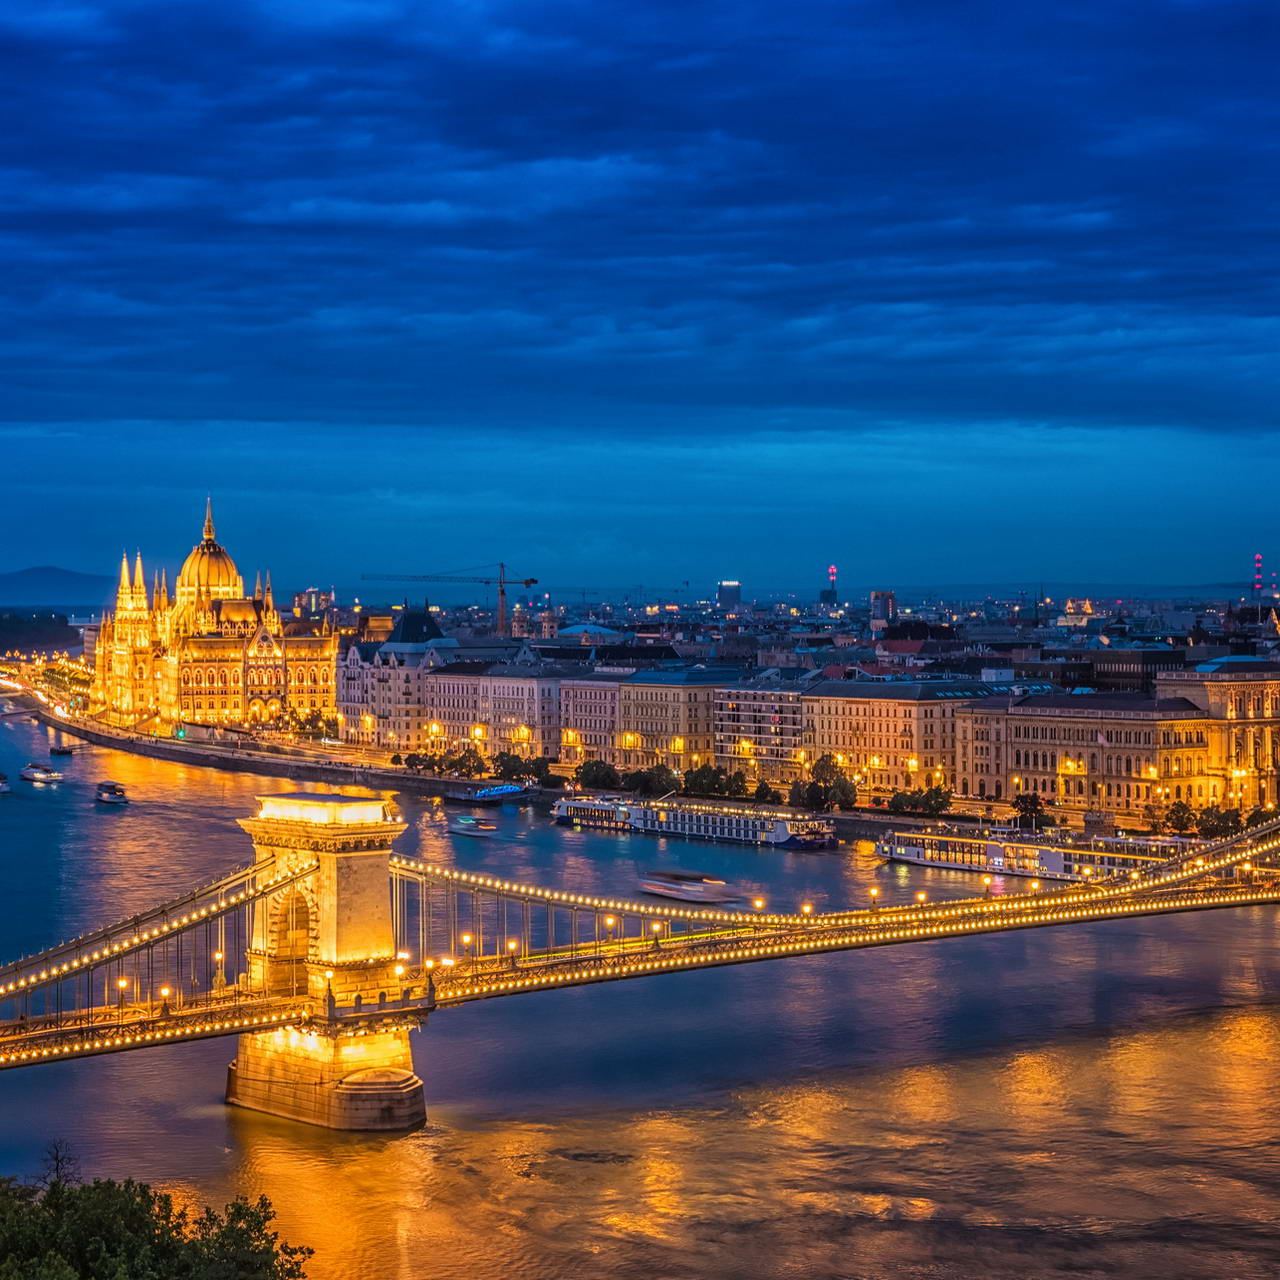 https://www.bestslovakiatours.com/wp-content/uploads/2021/09/Best-Slovakia-Tours_Hungary_1_resize.jpg